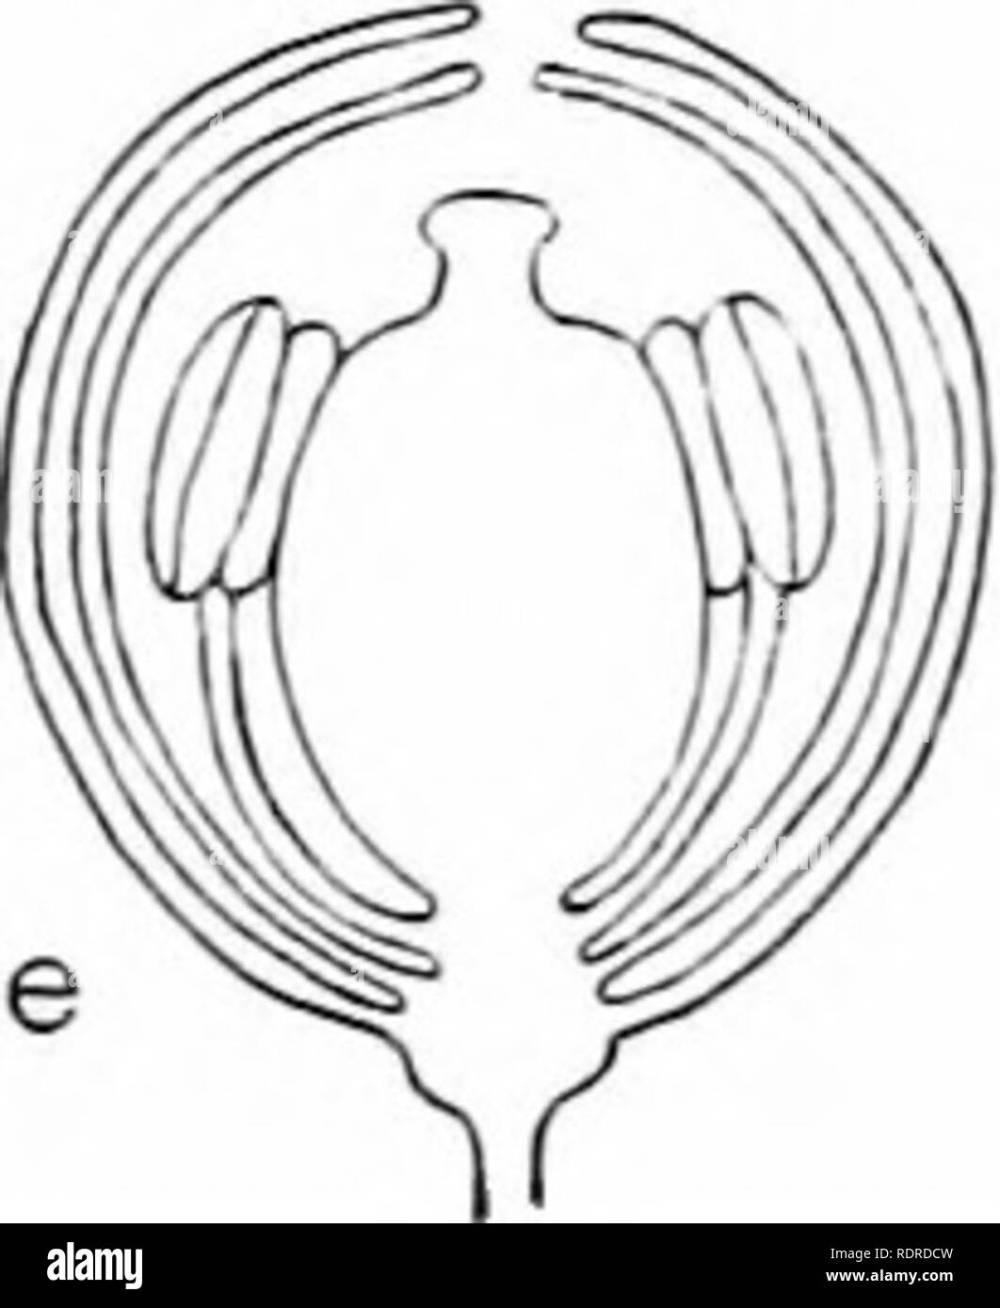 medium resolution of  capsella bursa astoris shepherd s purse a type page of student s laboratory book a entire plant b a flower enlarged c longitudinal diagram